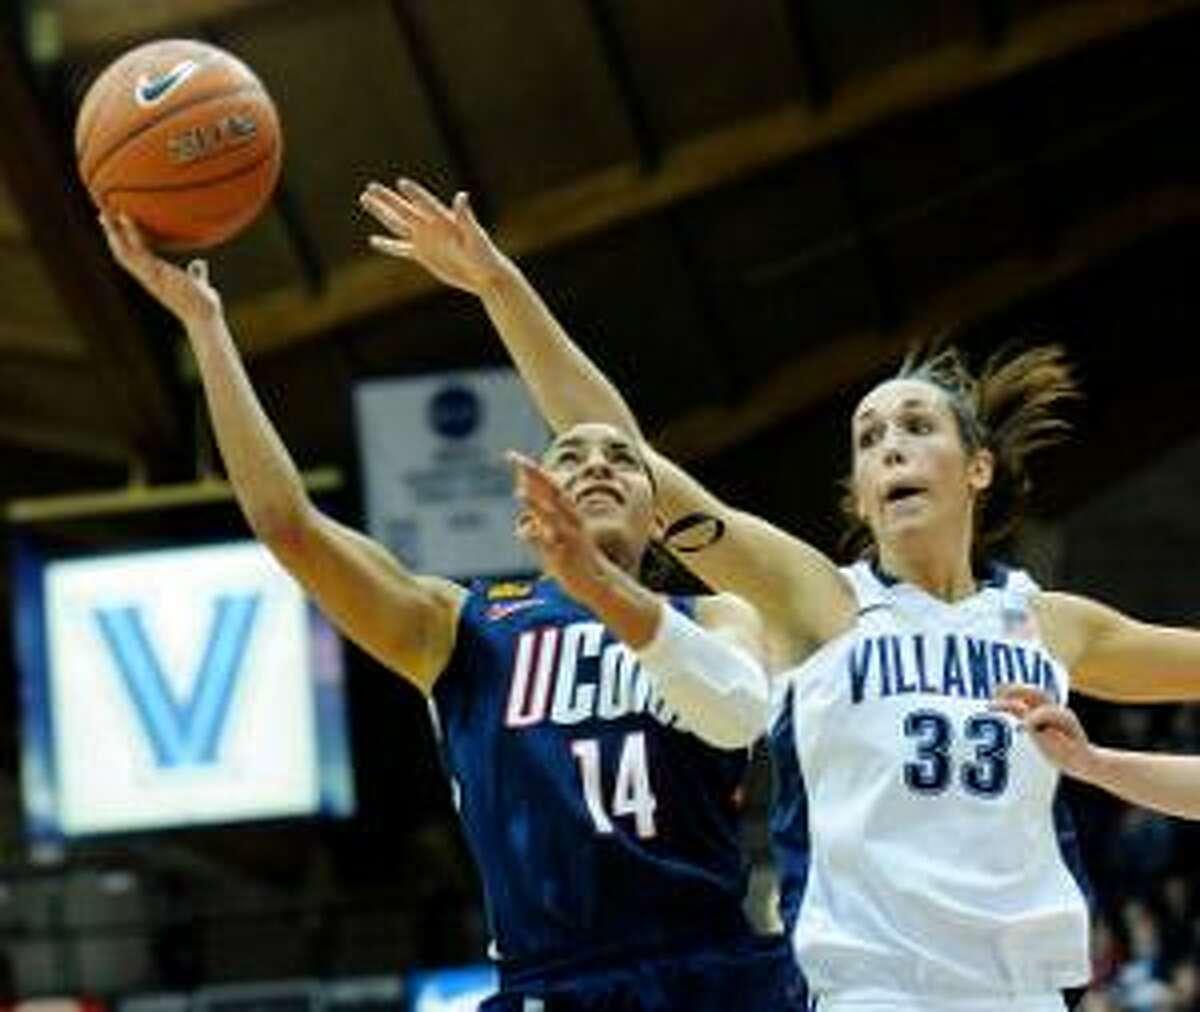 ASSOCIATED PRESS Connecticut's Bria Hartley (14) shoots over Villanova's Laura Sweeney (33) in the first half of Saturday's game in Villanova, Pa.